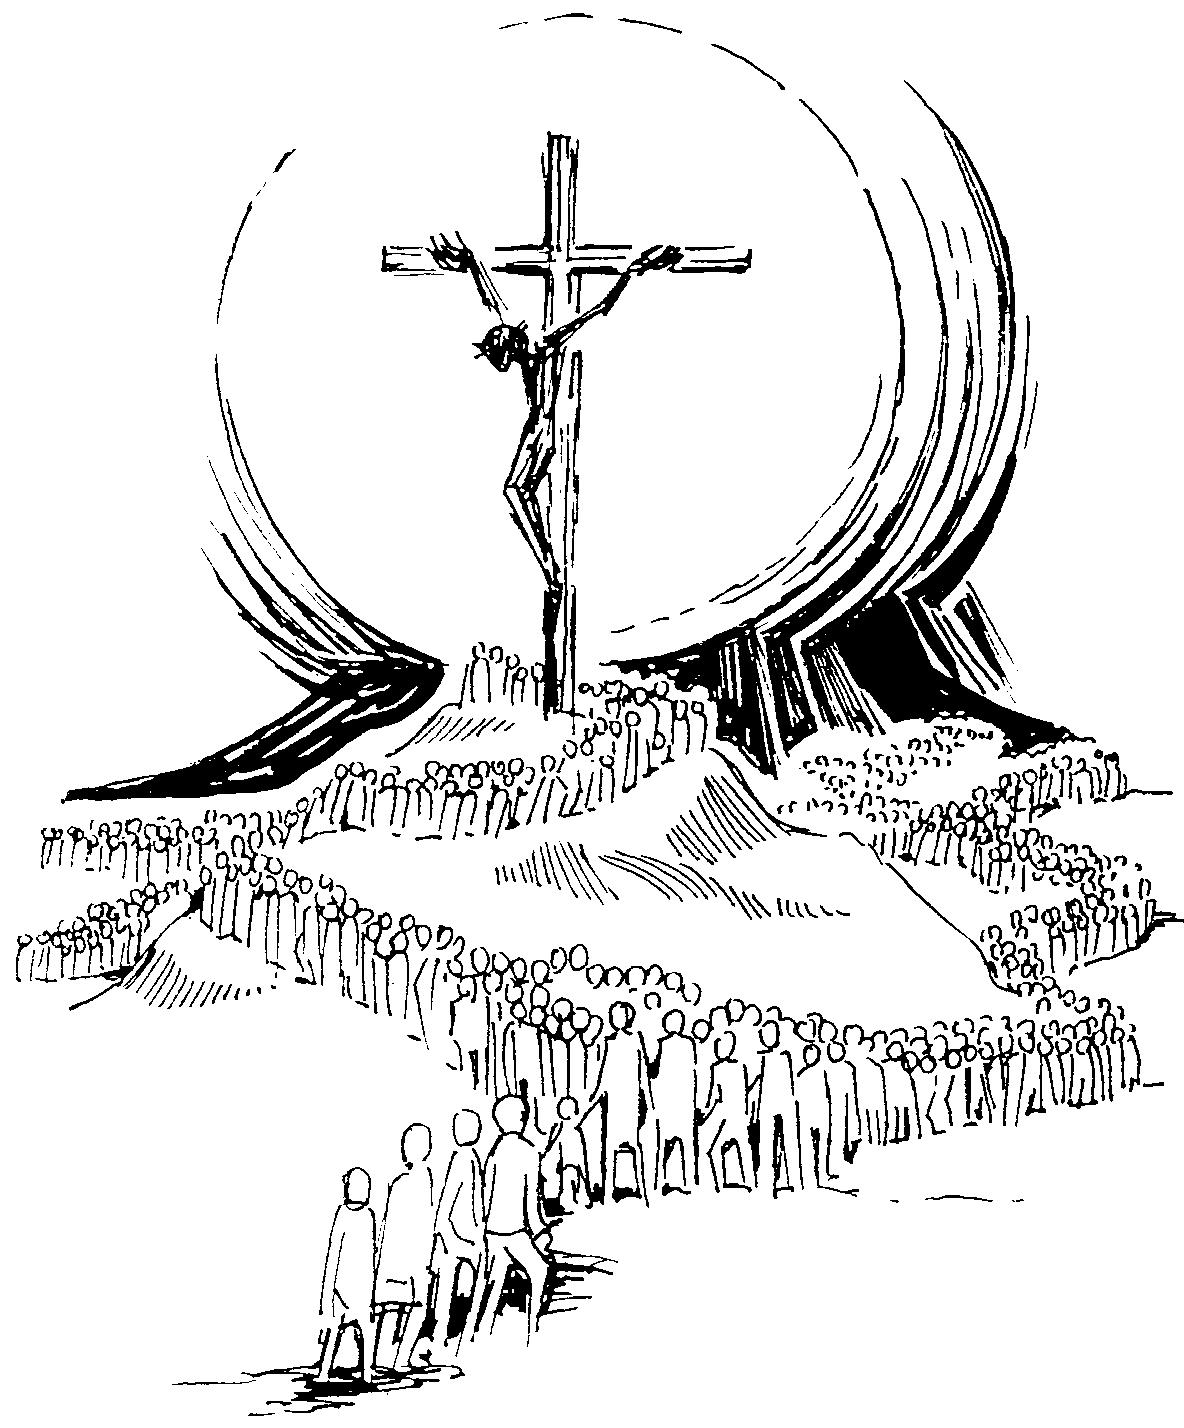 Dibujos de cruces para colorear - Dibujos para colorear - IMAGIXS